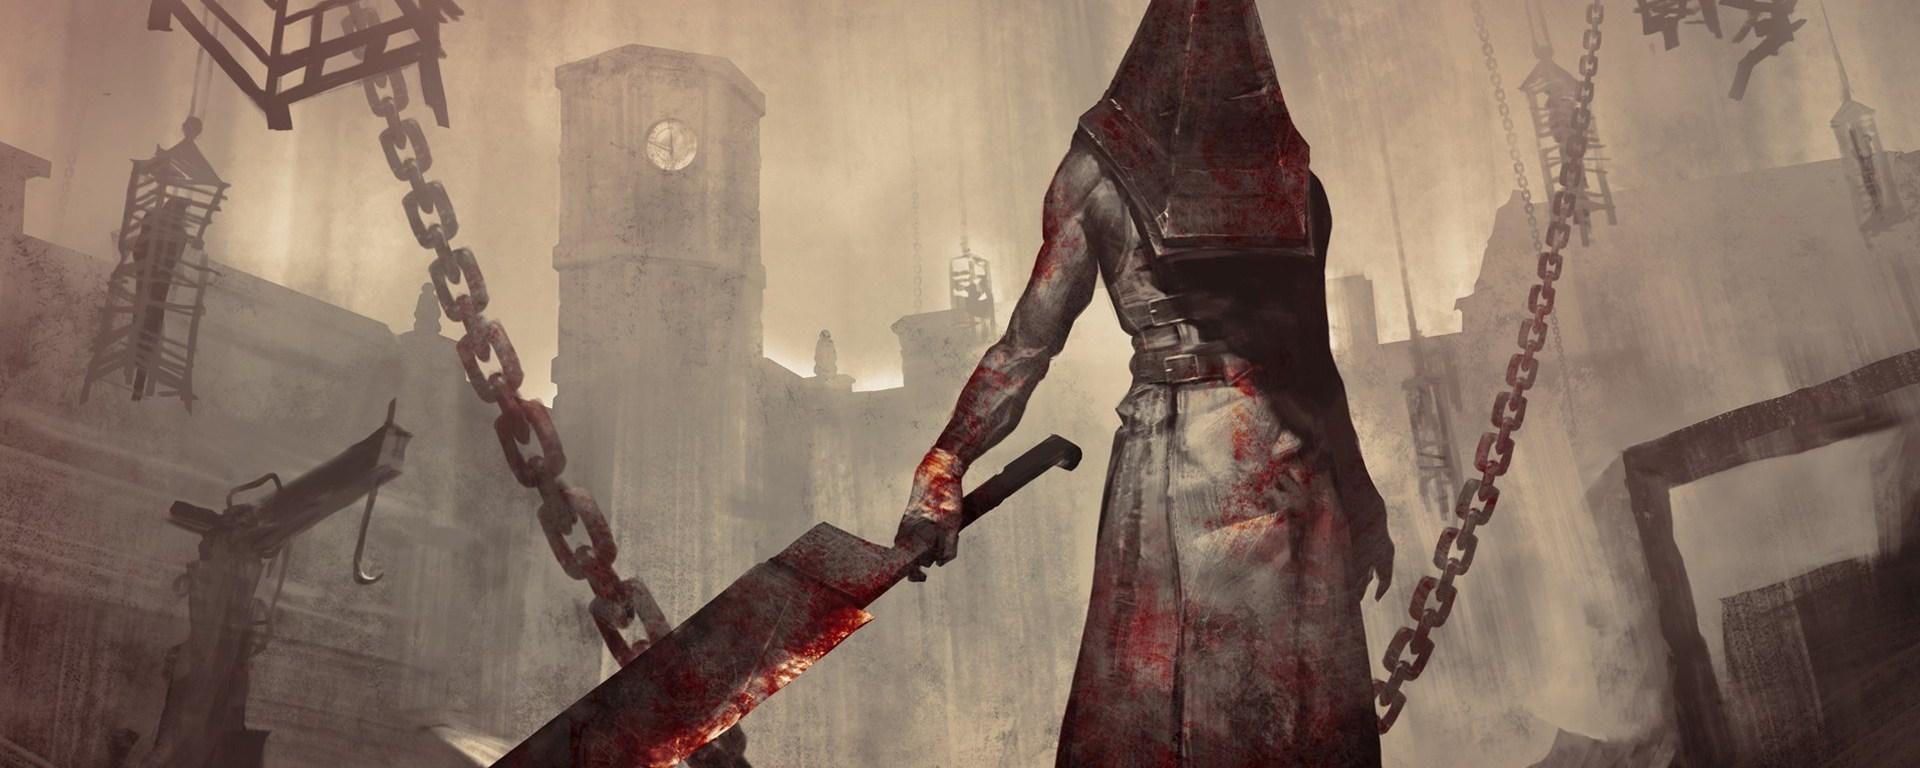 Silent-Hill-Cinema-Gizmo